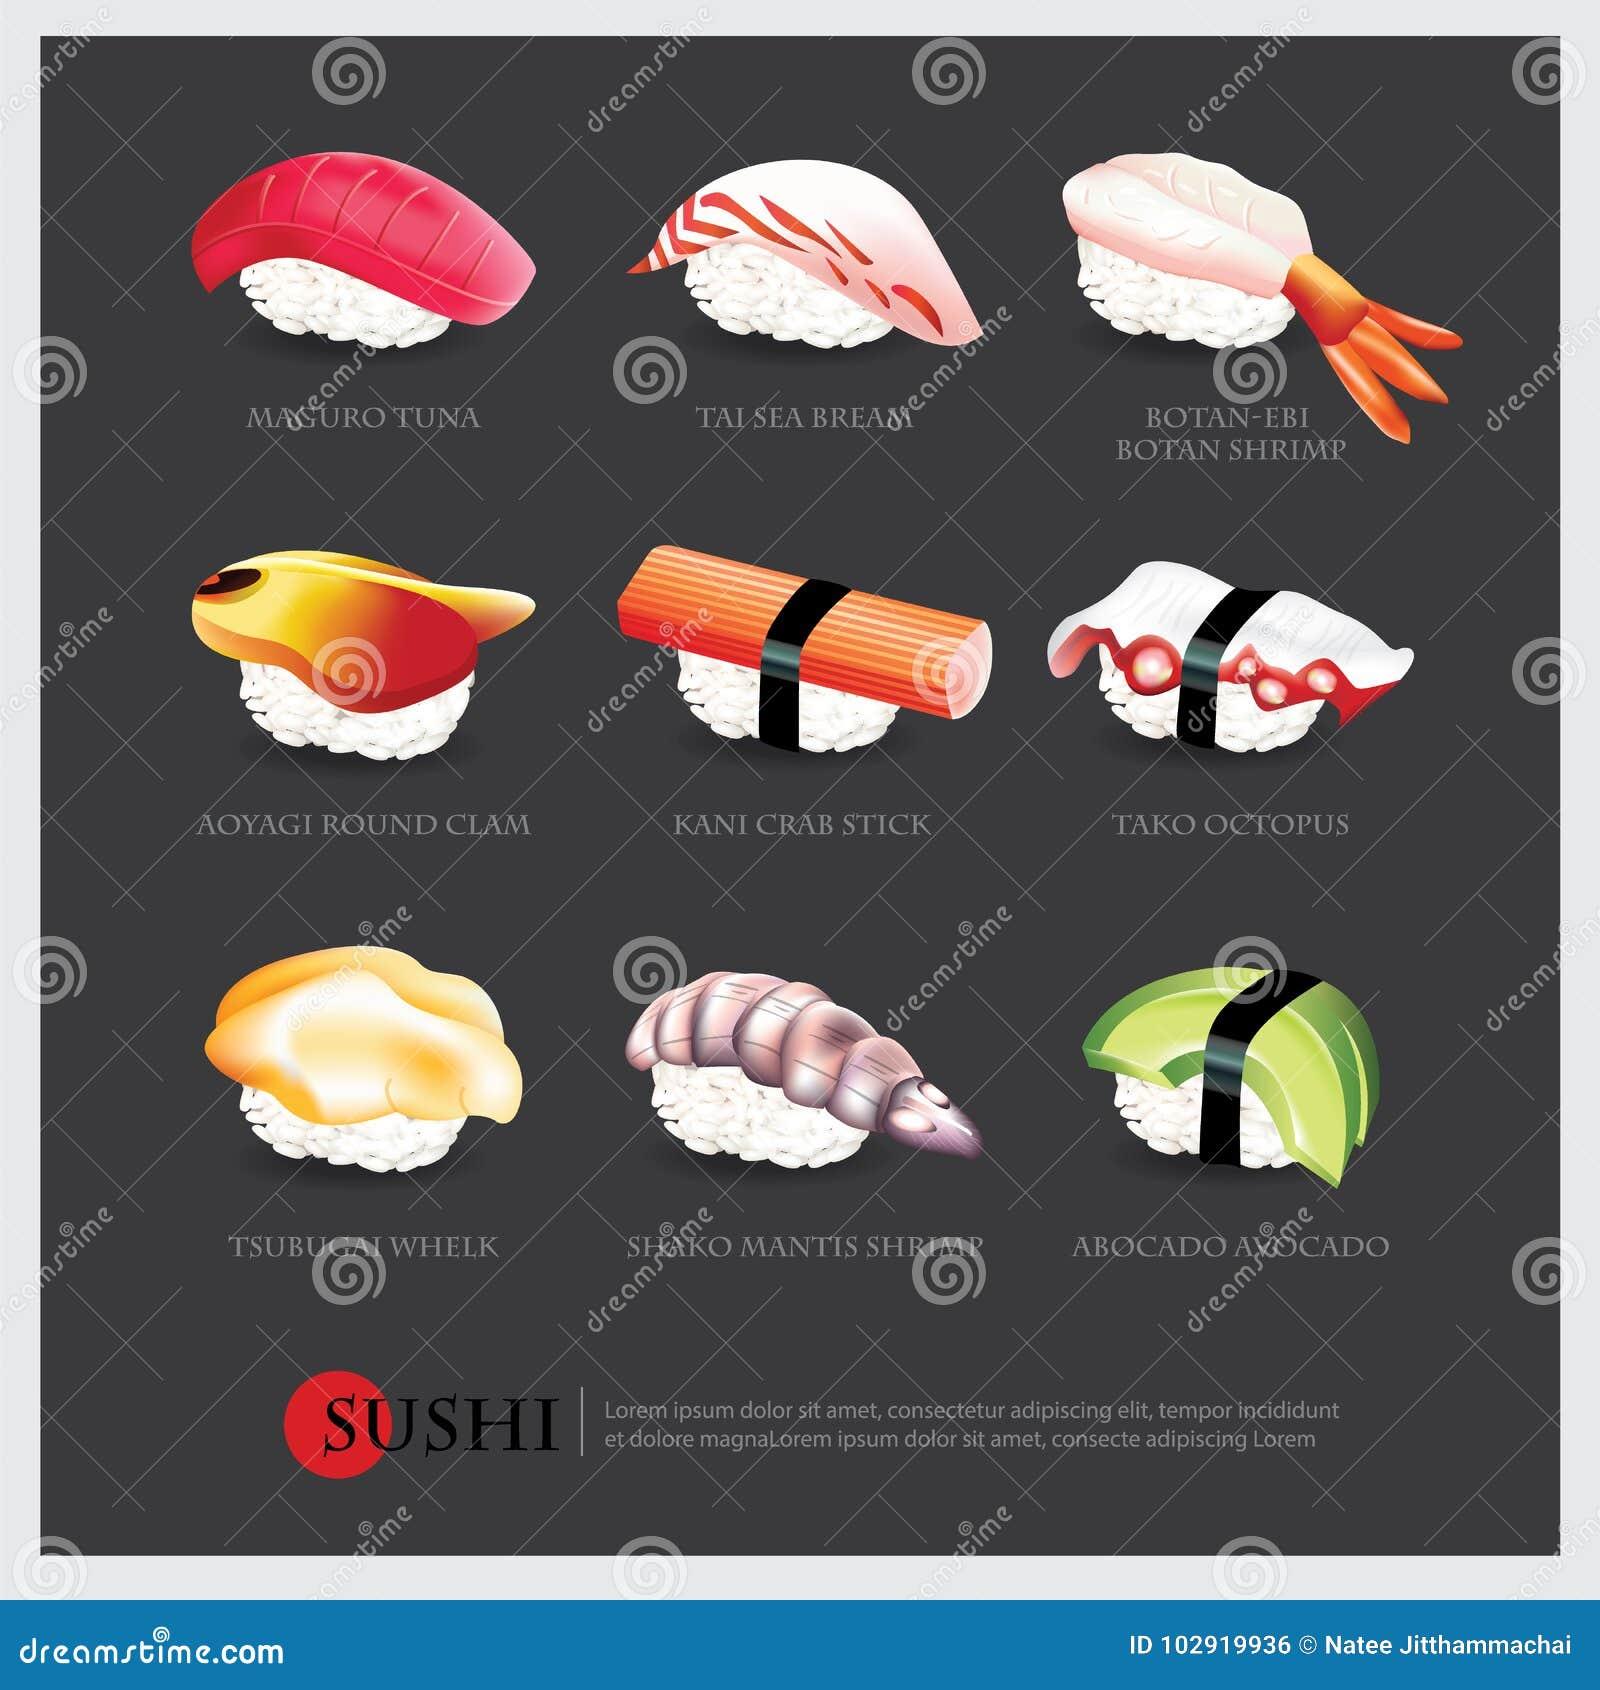 Sushi asian food realistic isolated